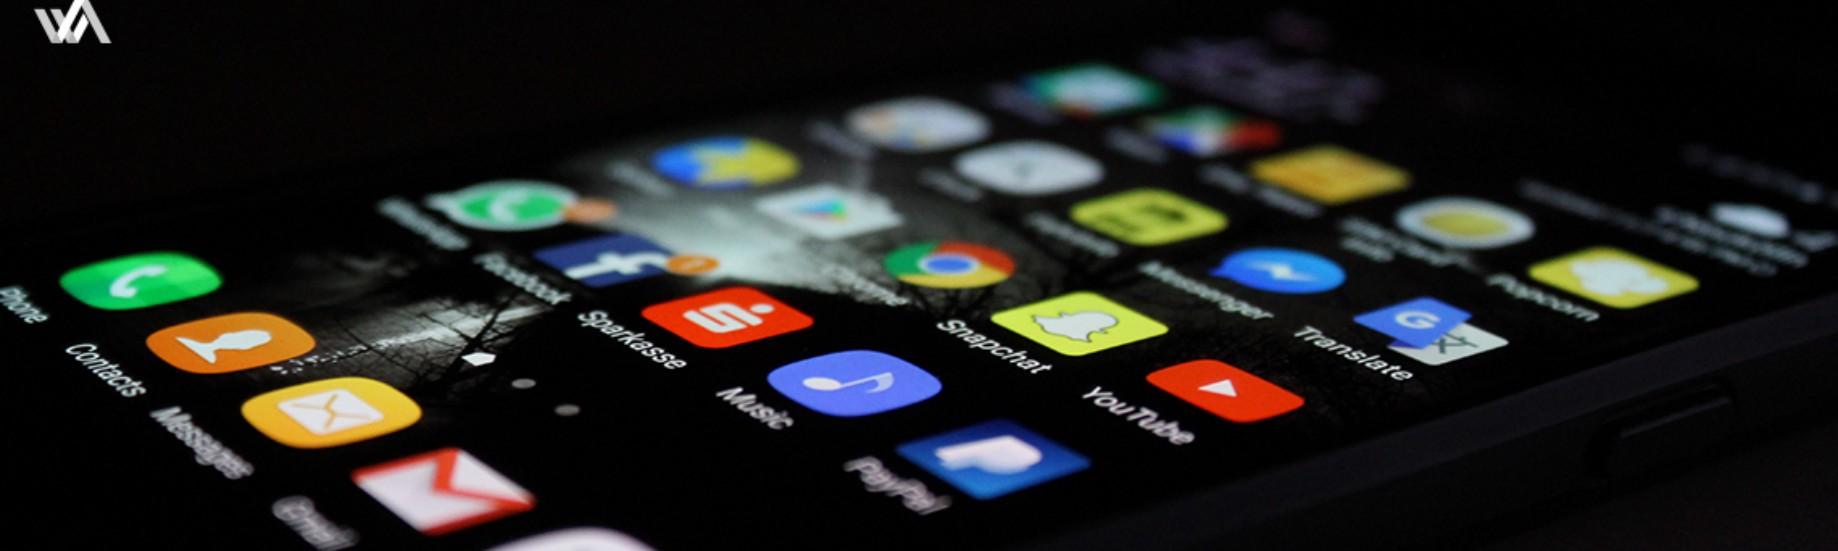 become an ios app developer